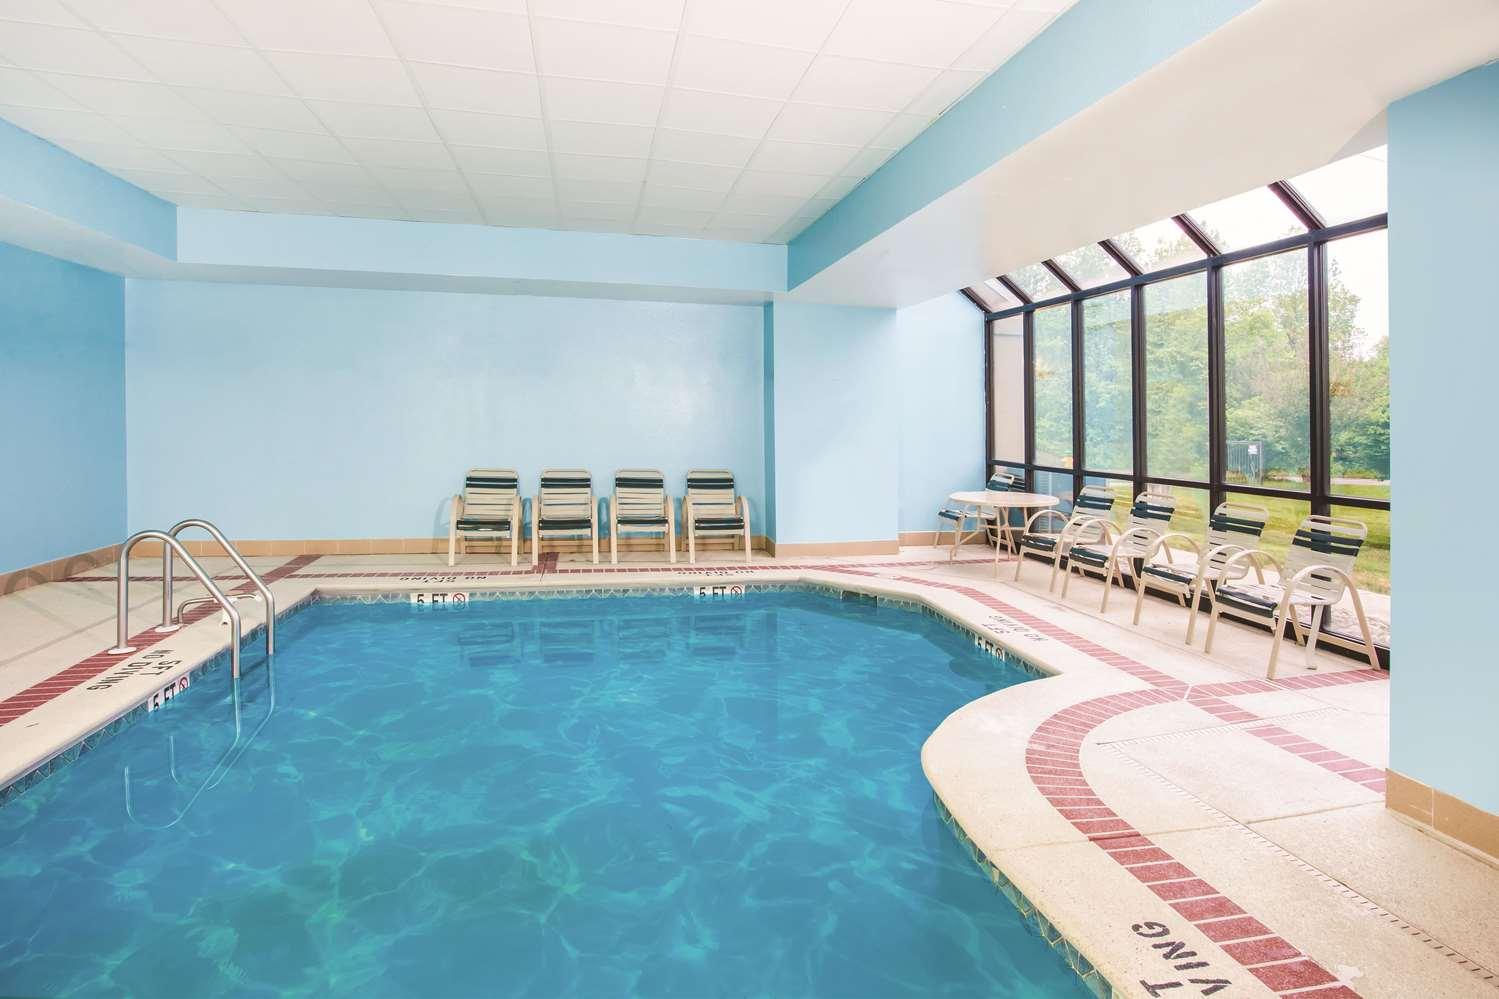 Pool - La Quinta Inn & Suites Elkton